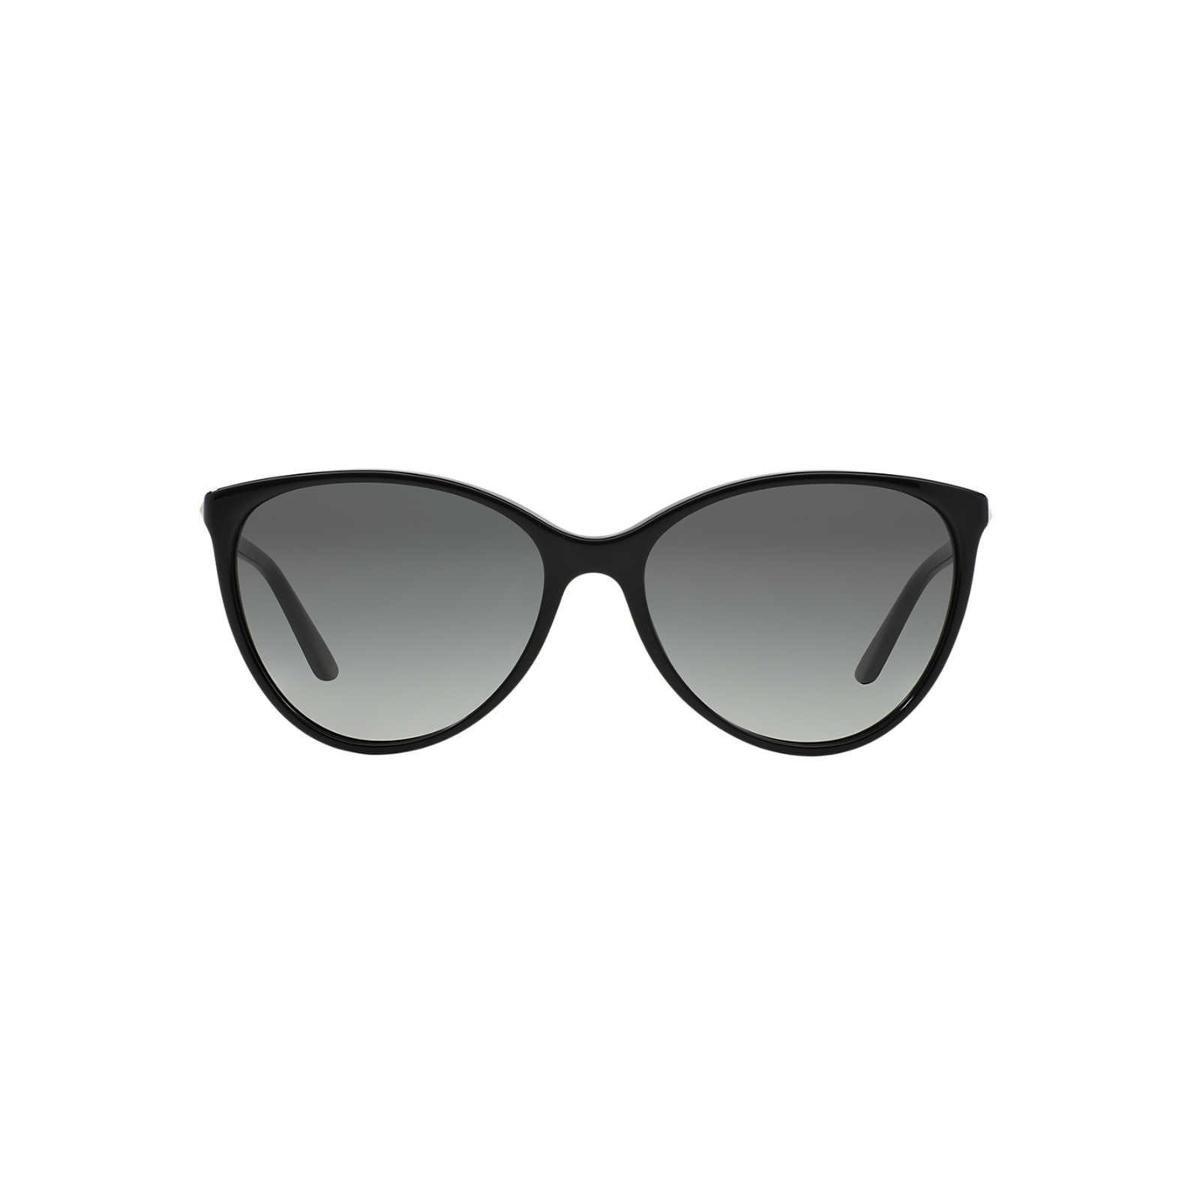 ecf49b9134780 Óculos de Sol Versace Piloto VE4260 Feminino - Compre Agora   Zattini